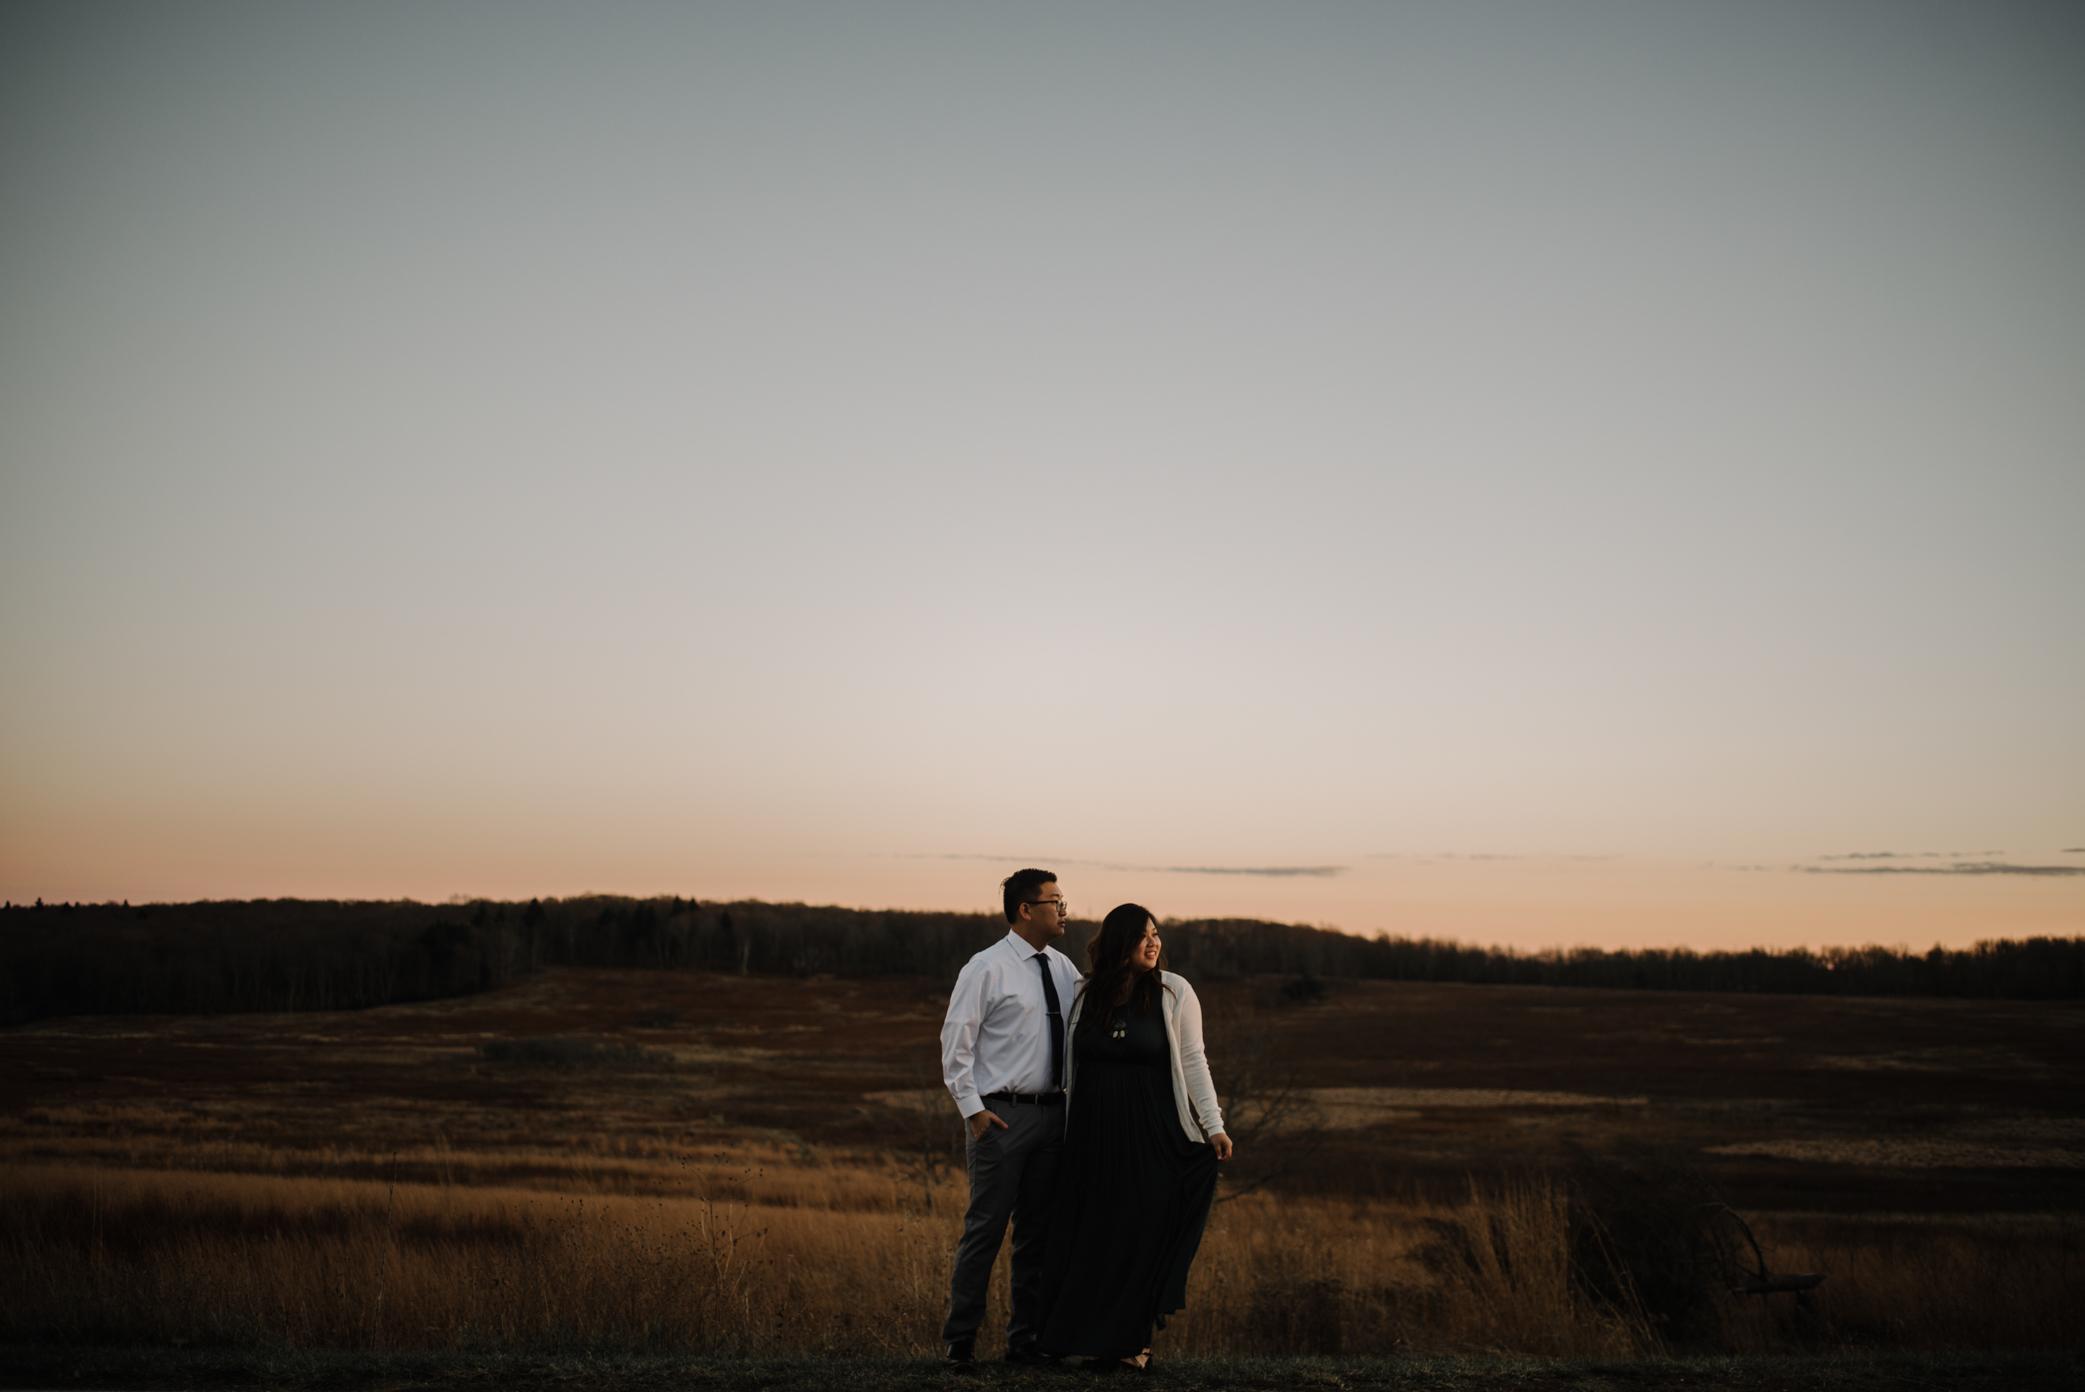 Joshua and Kristina - Shenandoah National Park - Skyline Drive - Winter Engagement Session Photographer - White Sails Creative_38.JPG